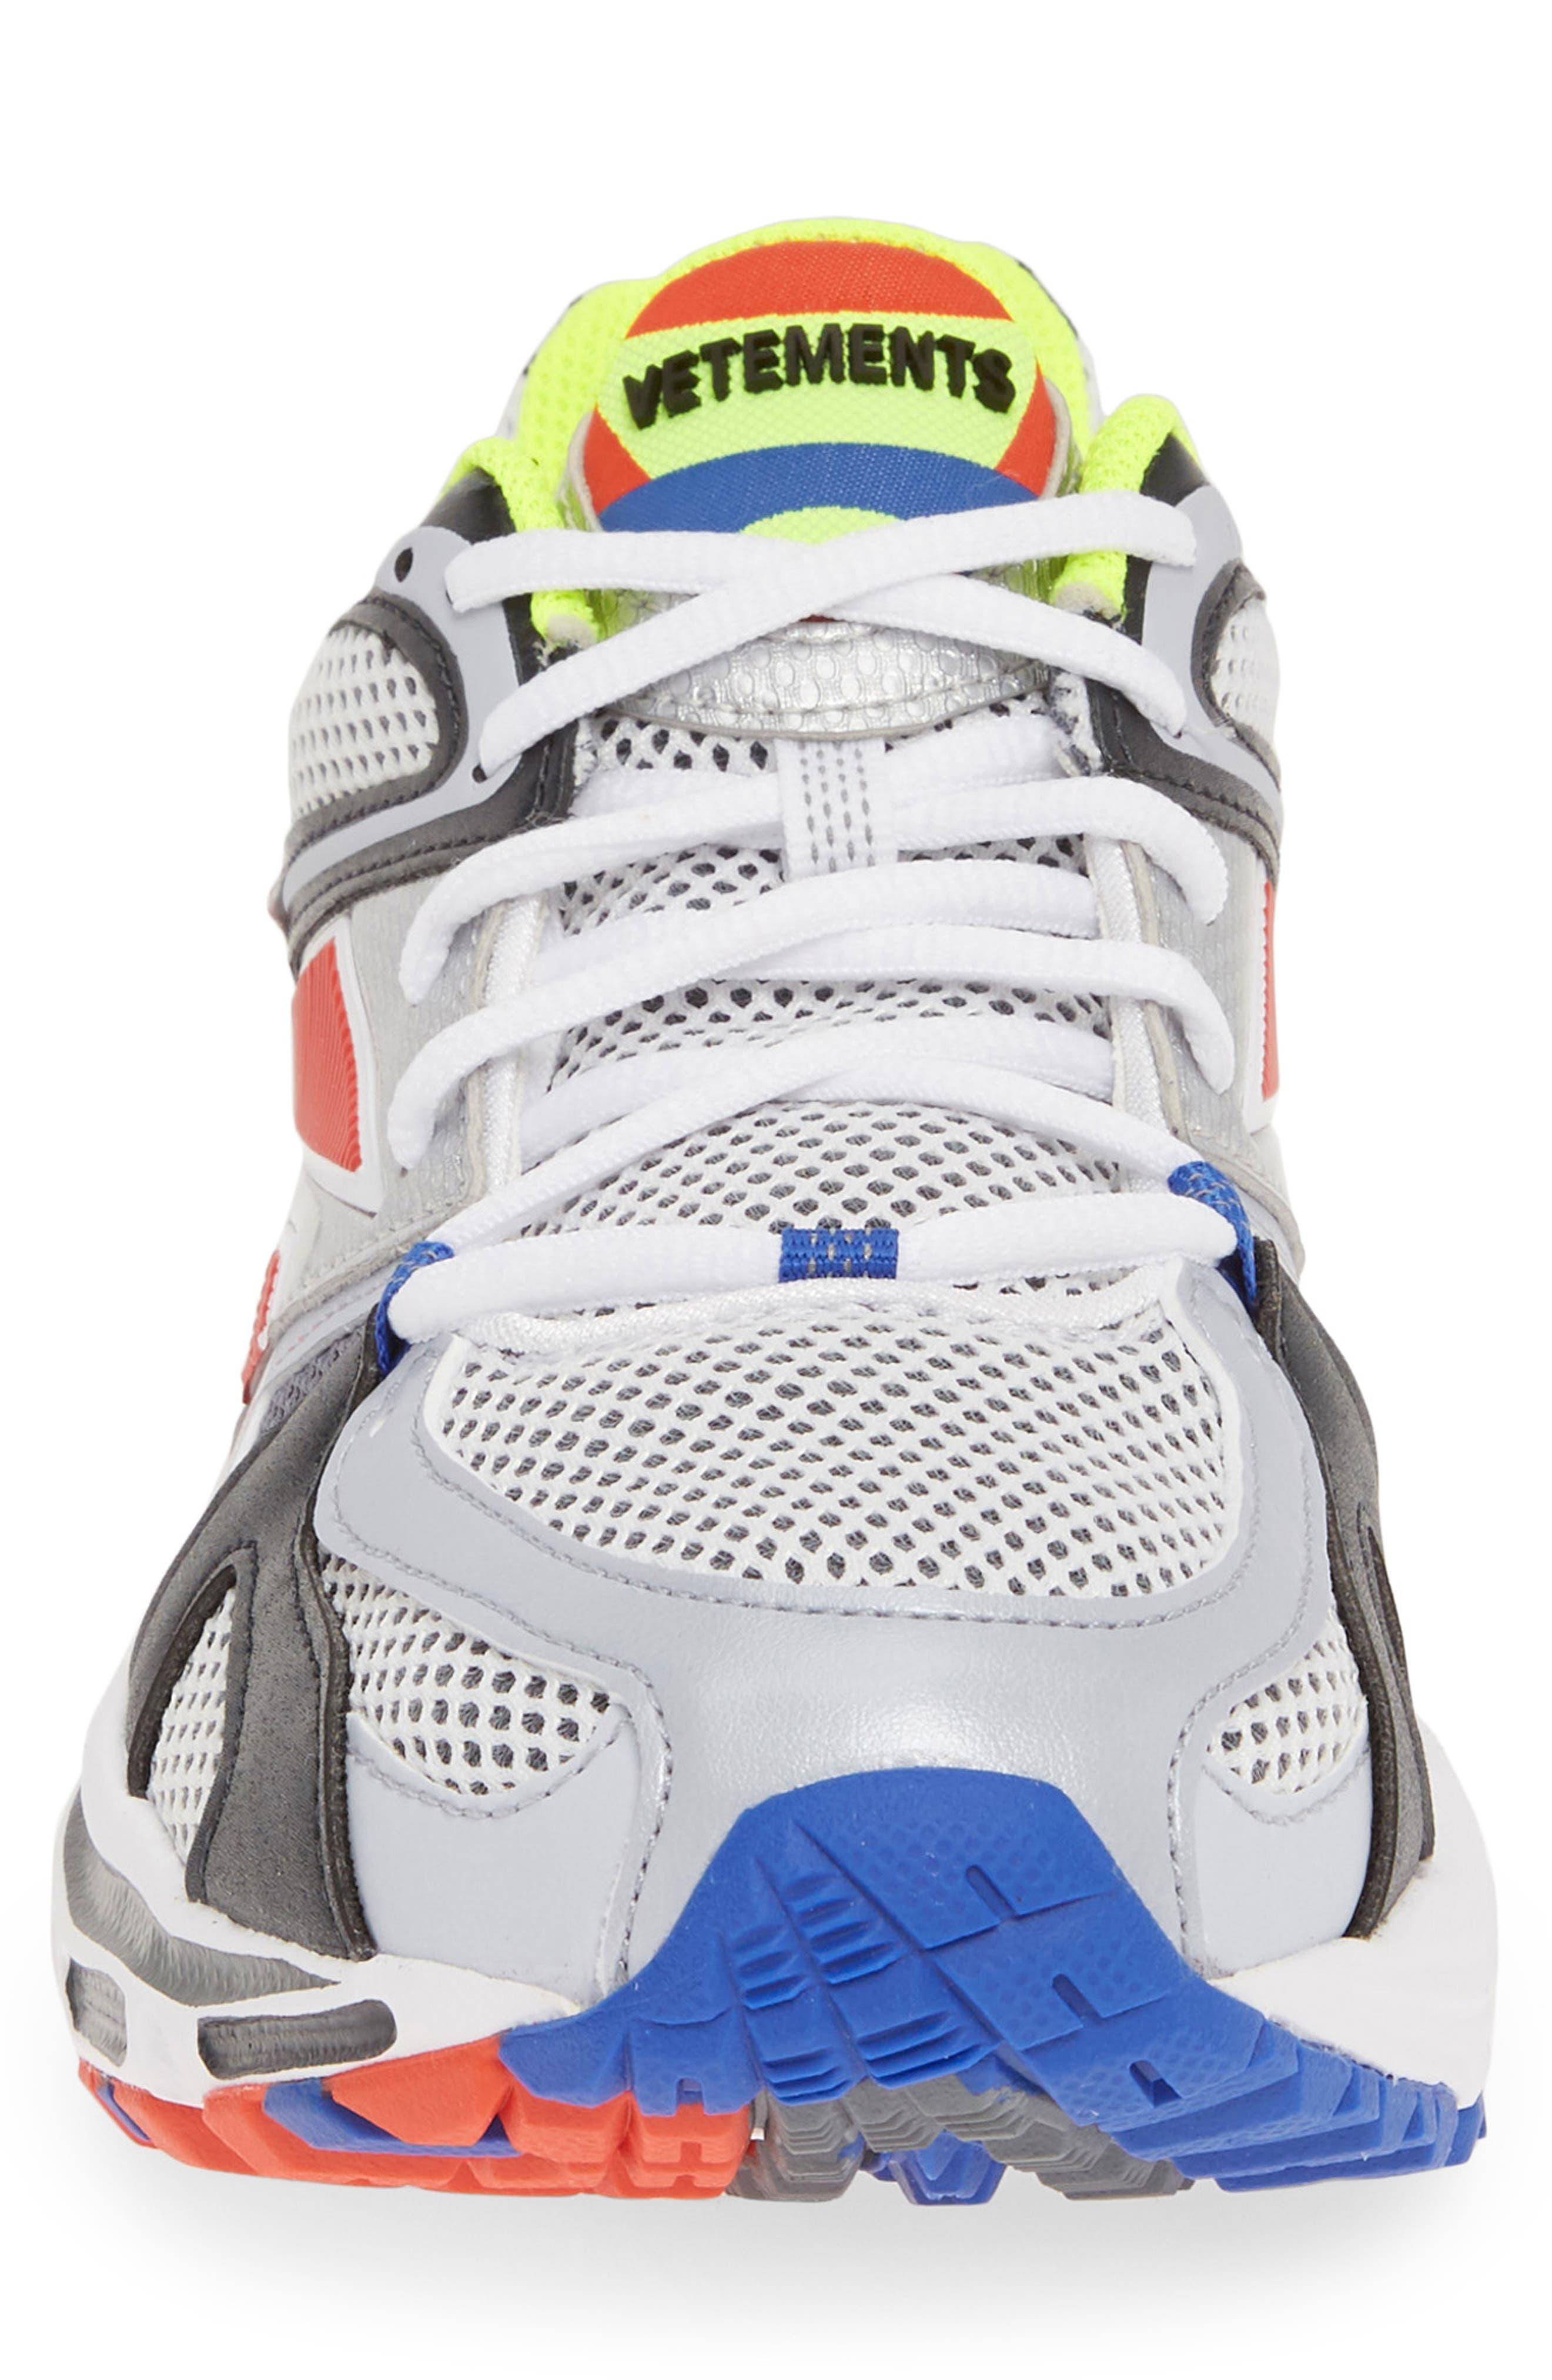 VETEMENTS, x Reebok Spike Runner 200 Sneaker, Alternate thumbnail 4, color, FLUO YELLOW